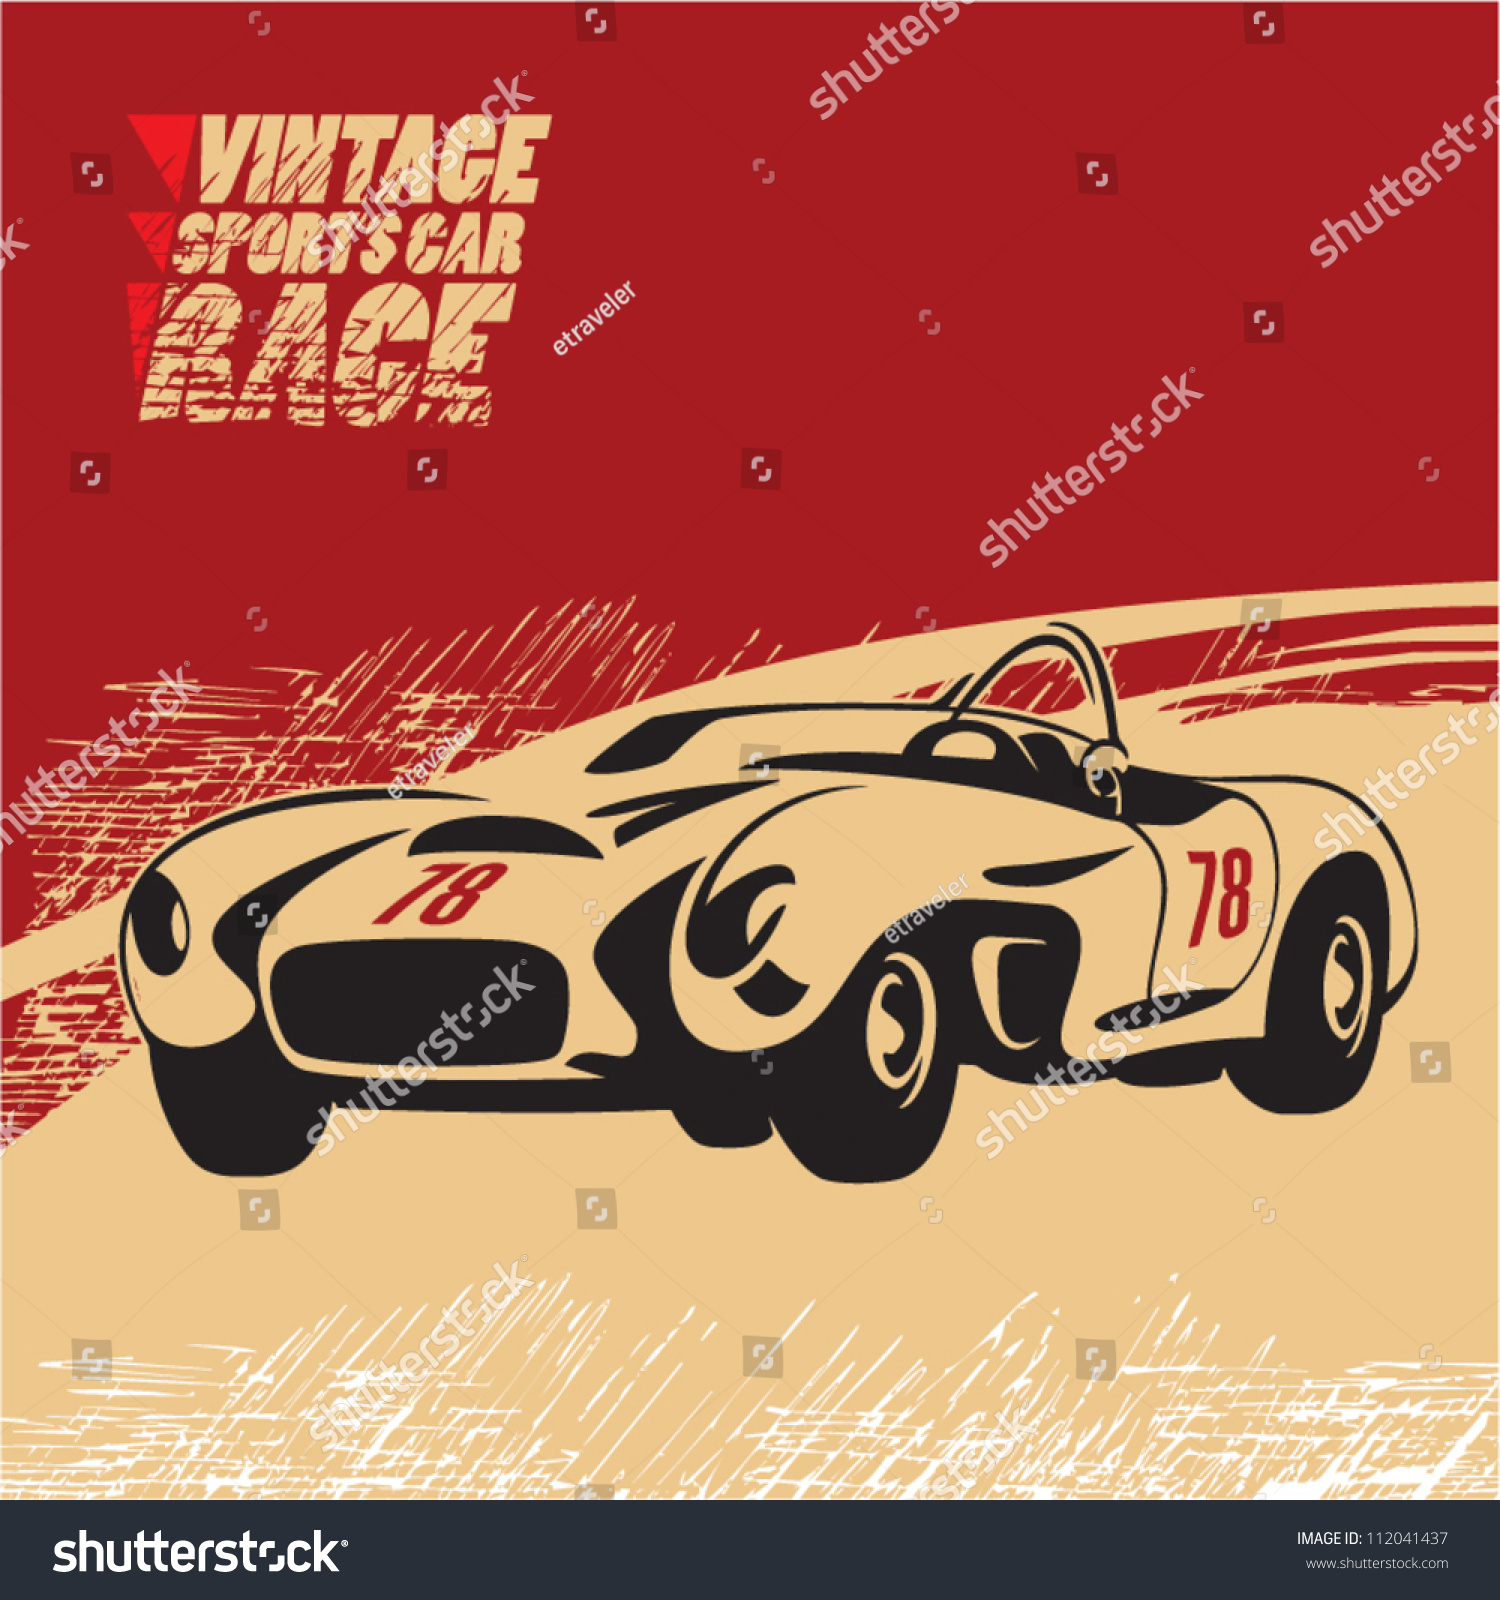 Vintage Sportscar 105